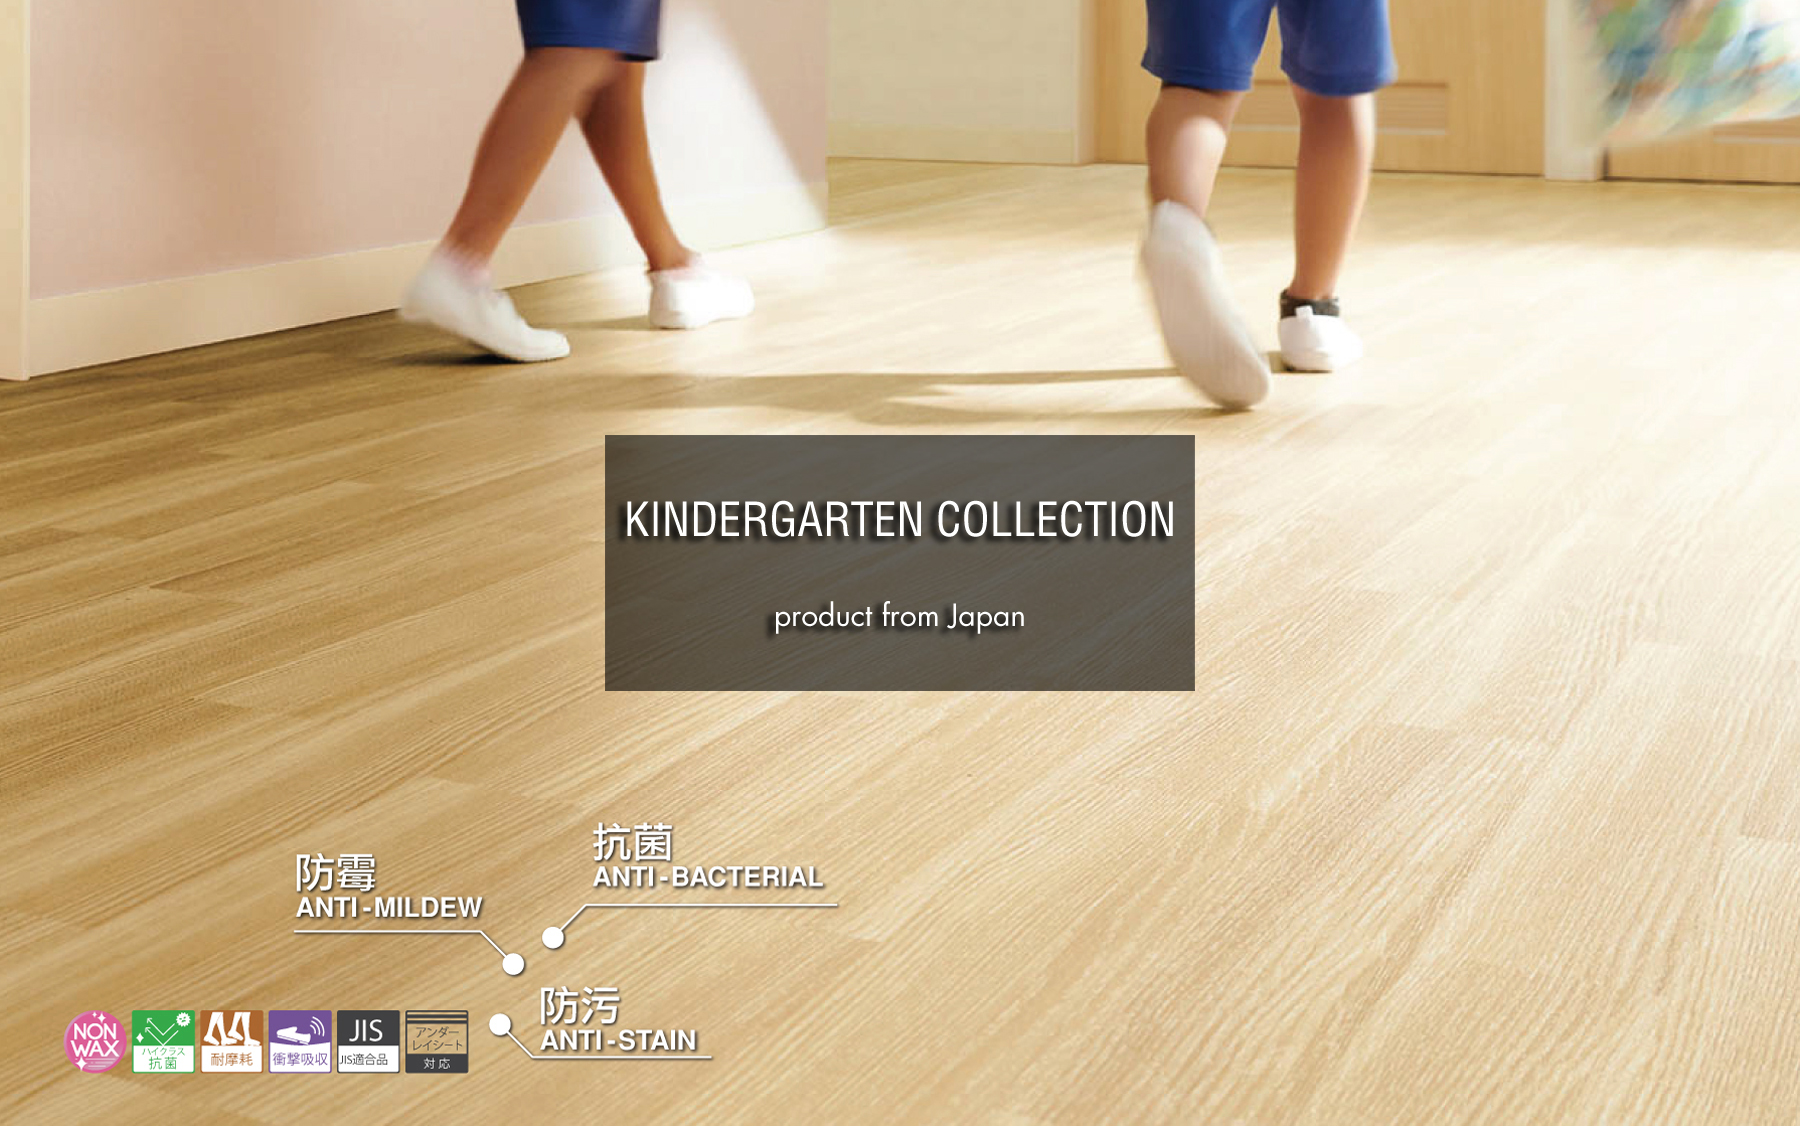 Tat Ming Flooring Slide Image Kingdergarten Collection